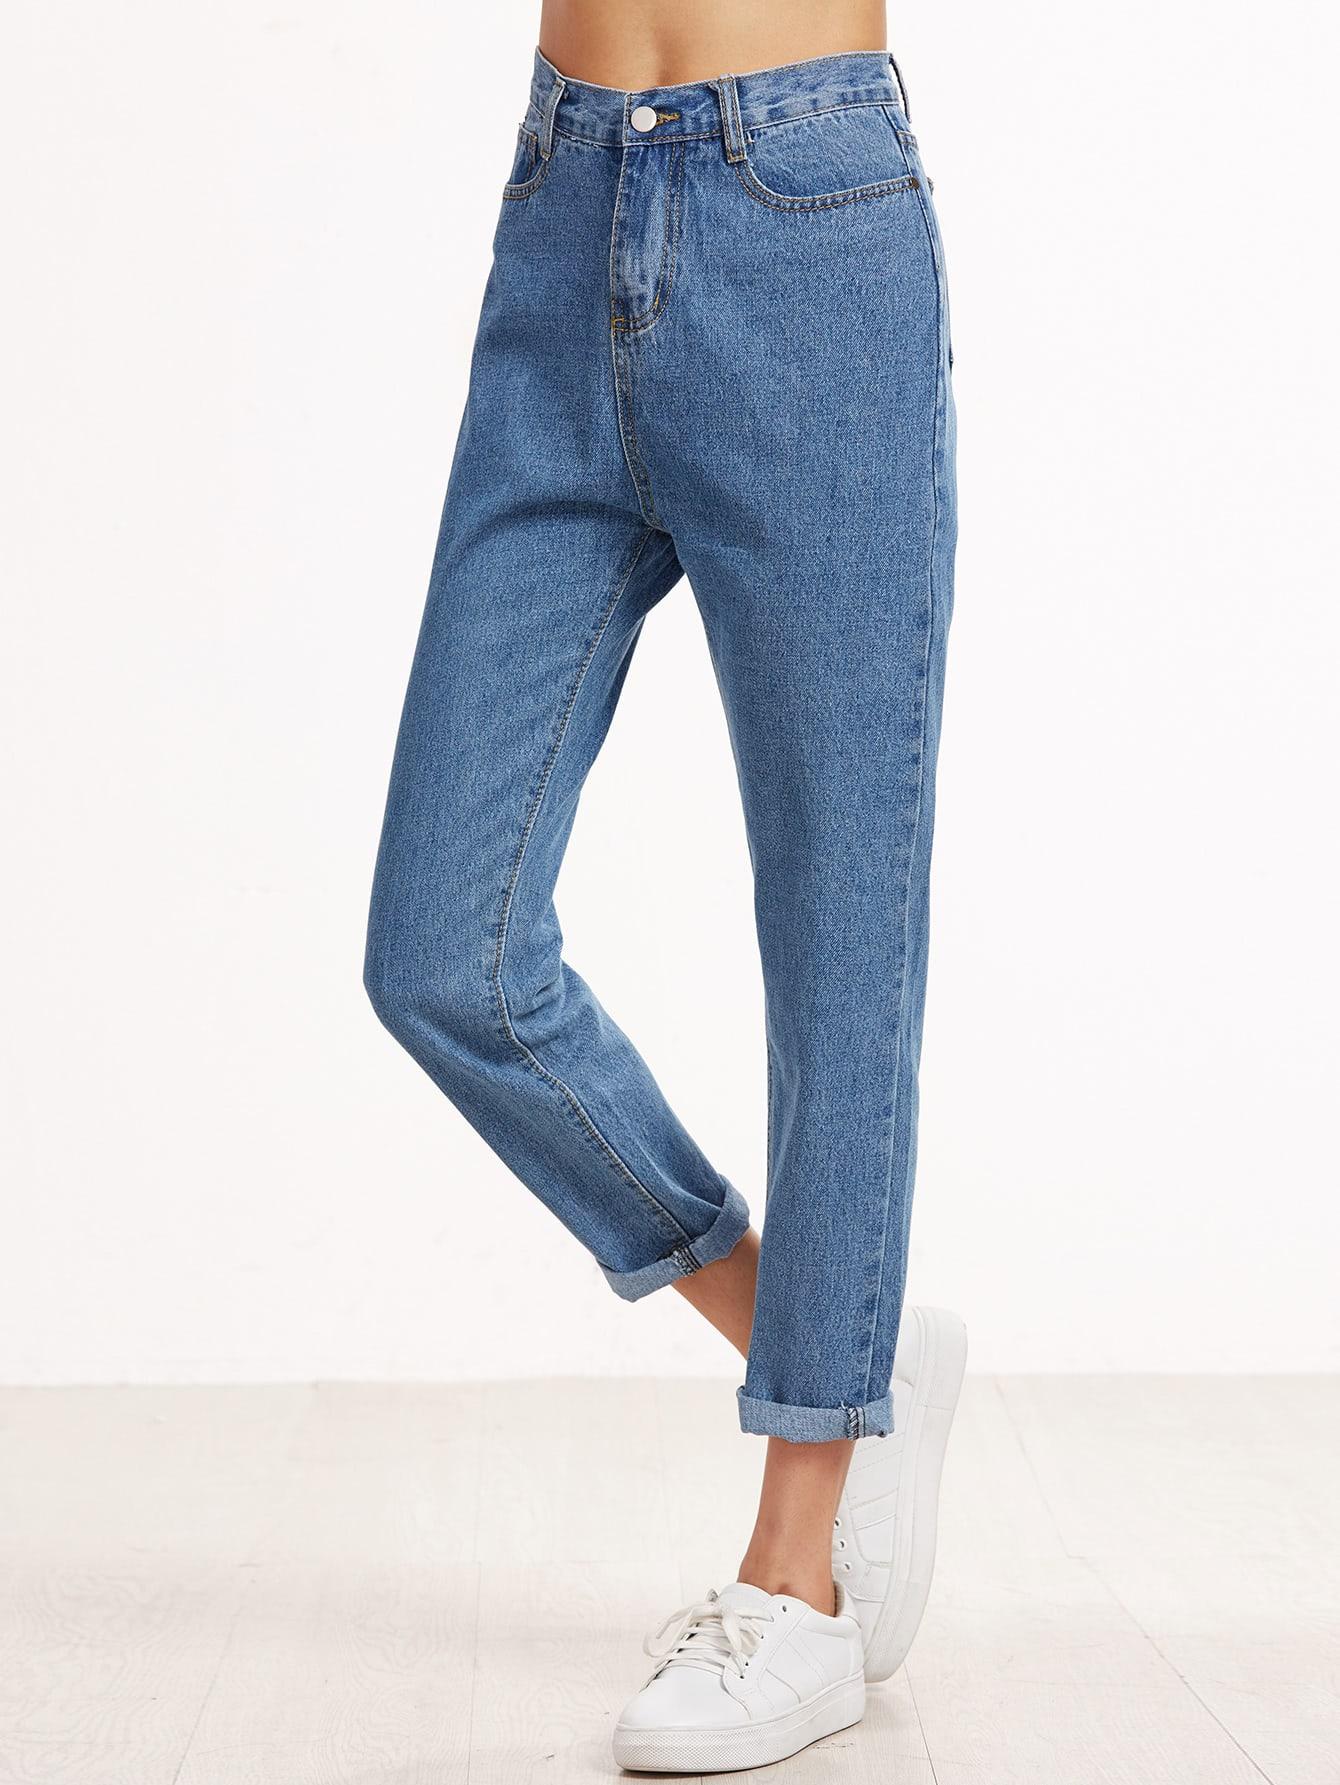 Mom Jeans Vintage Style